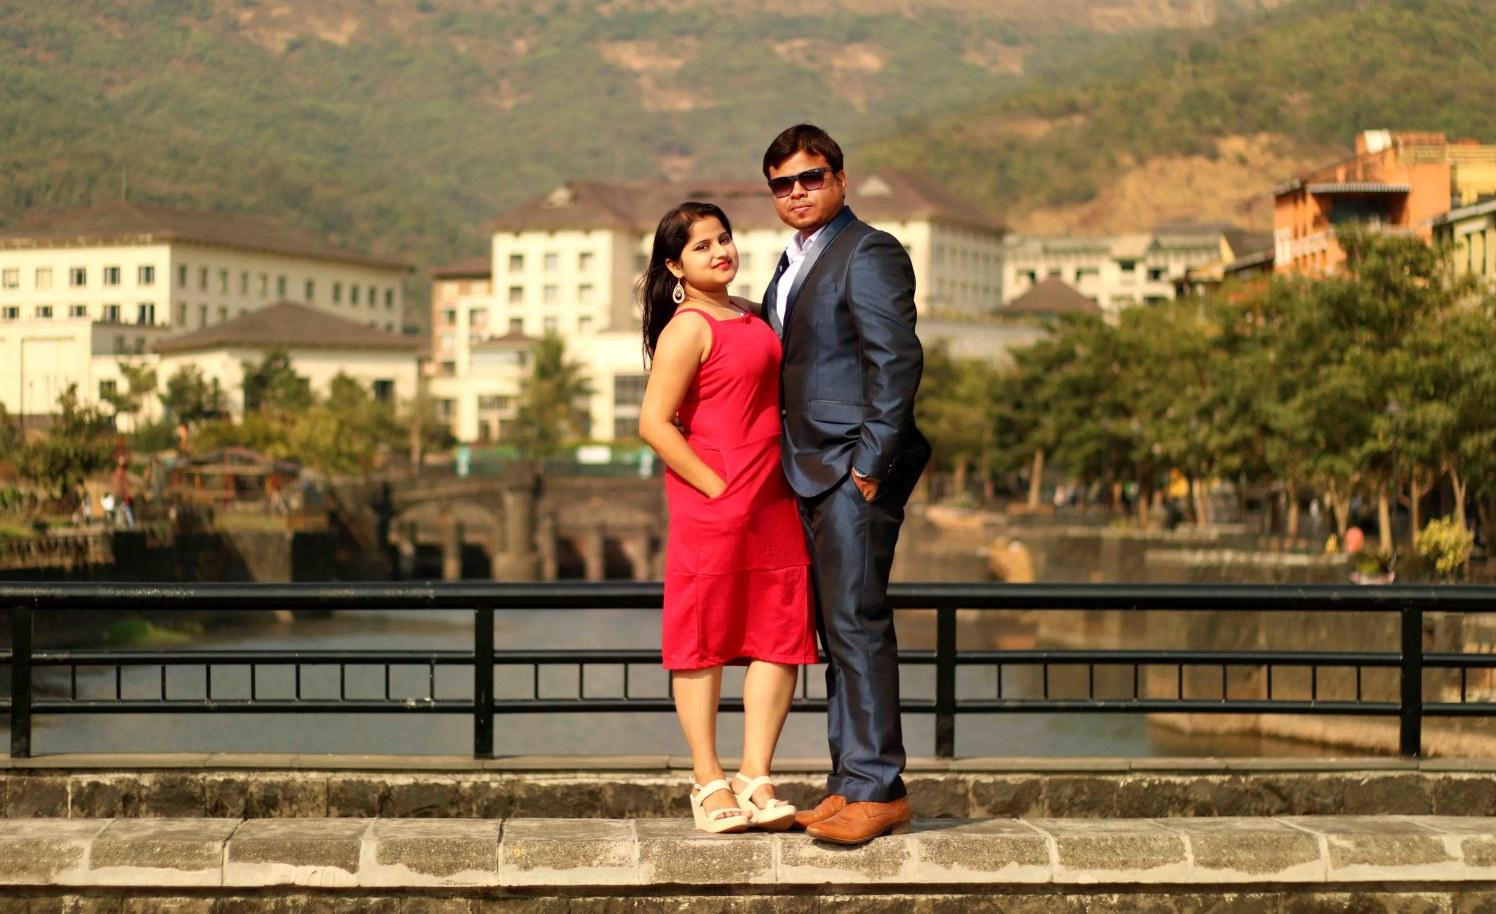 Zest at gape by Rushil Jadhav Wedding-photography | Weddings Photos & Ideas